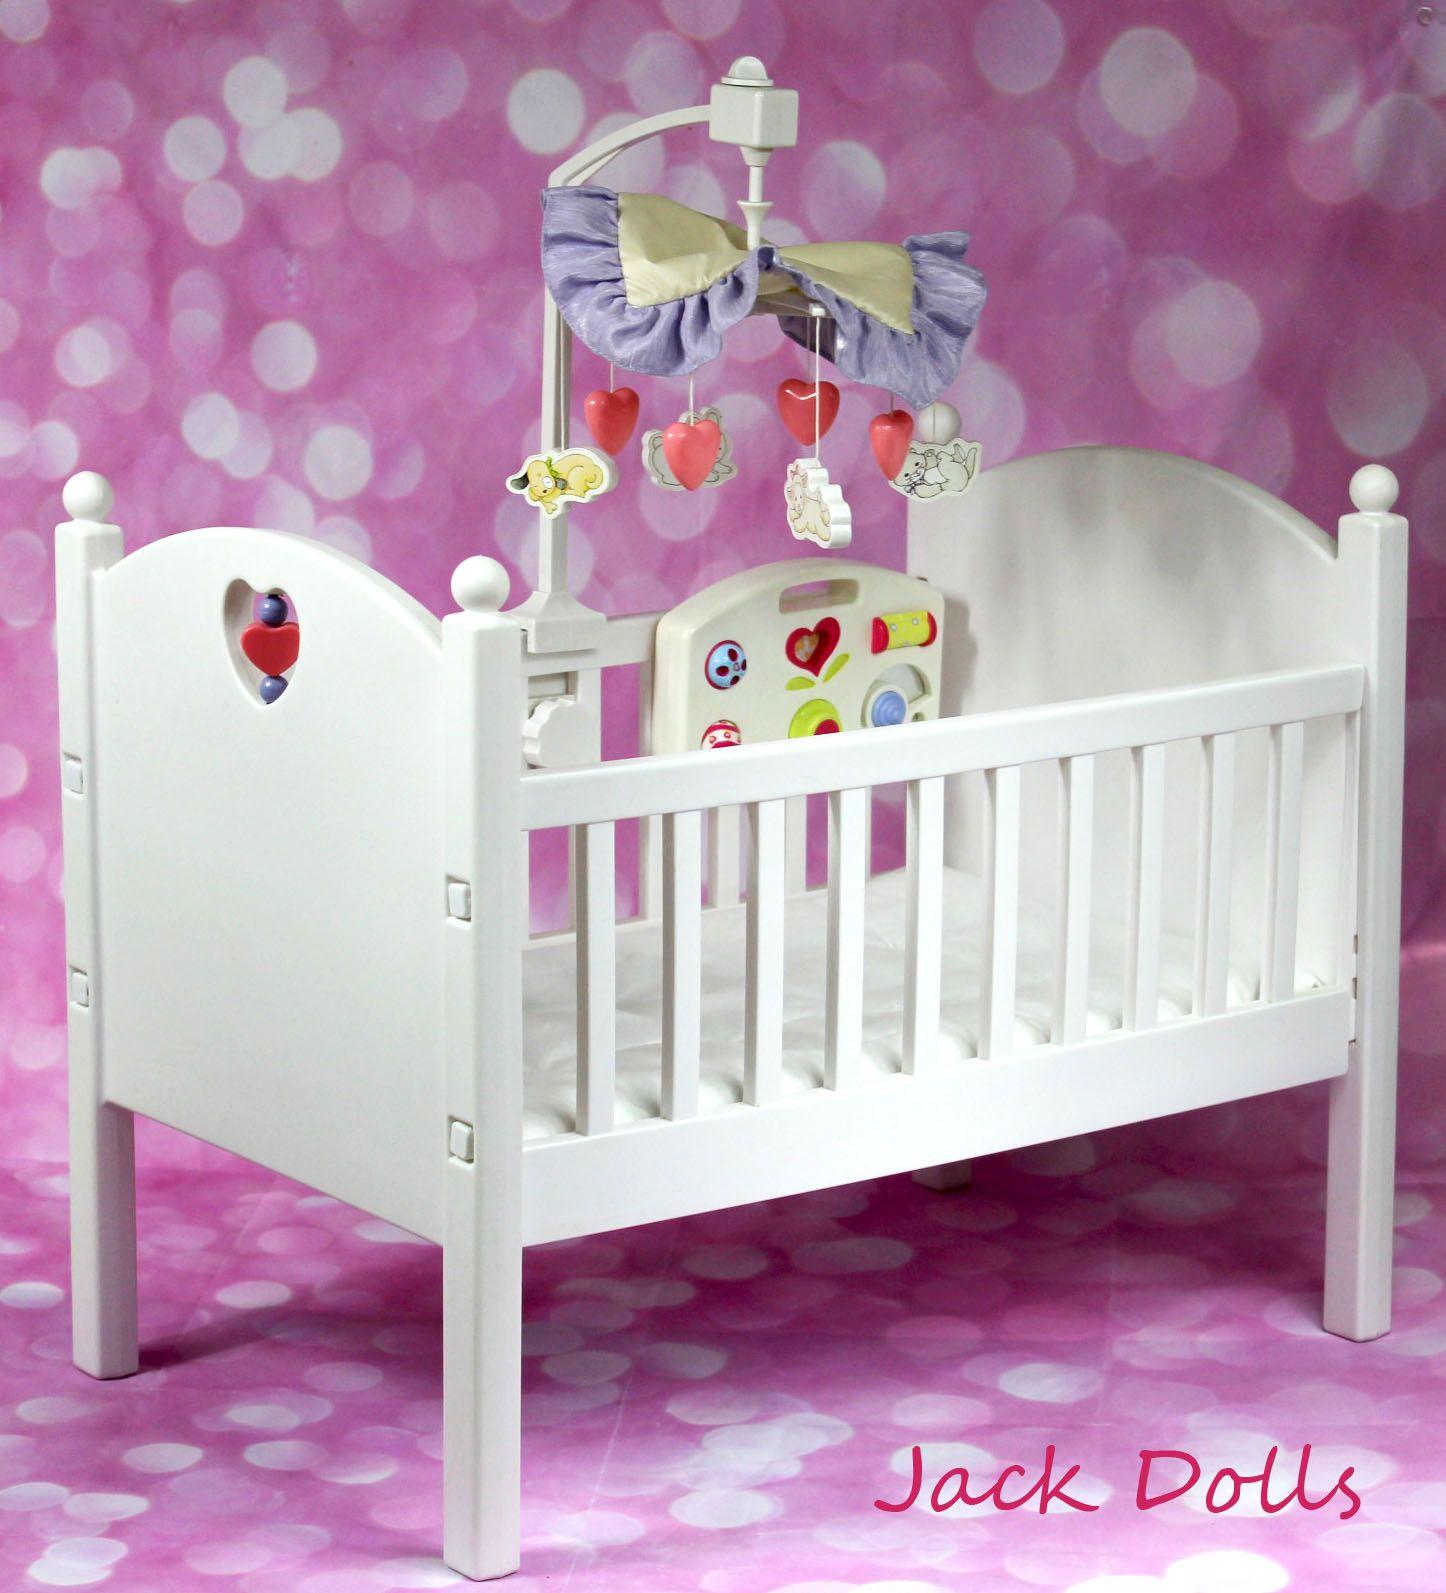 Bitty Baby Crib Toy baby crib, Bitty baby american girl